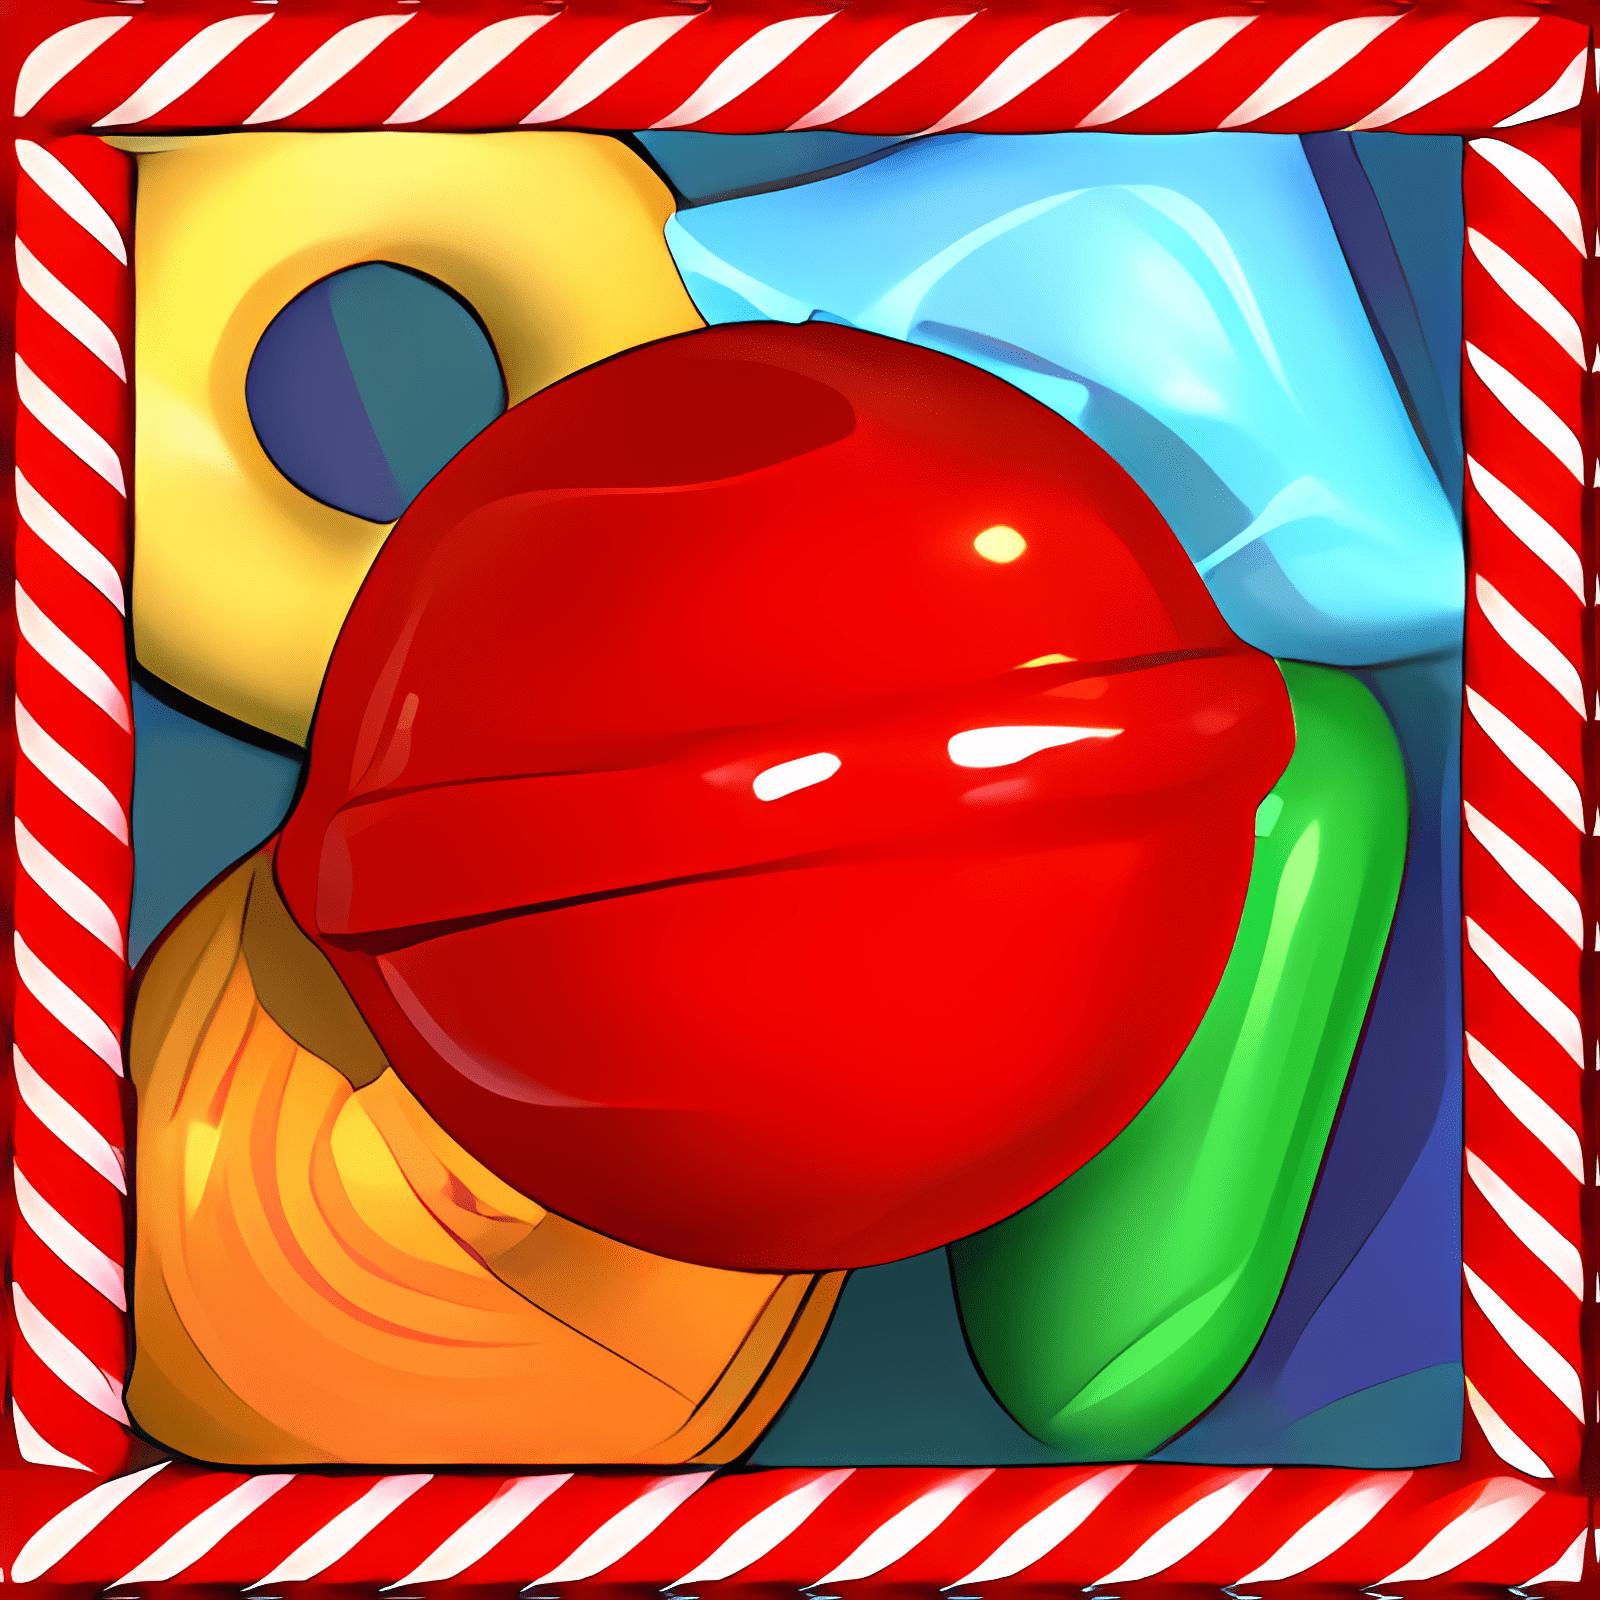 Candy Fun for Windows 10